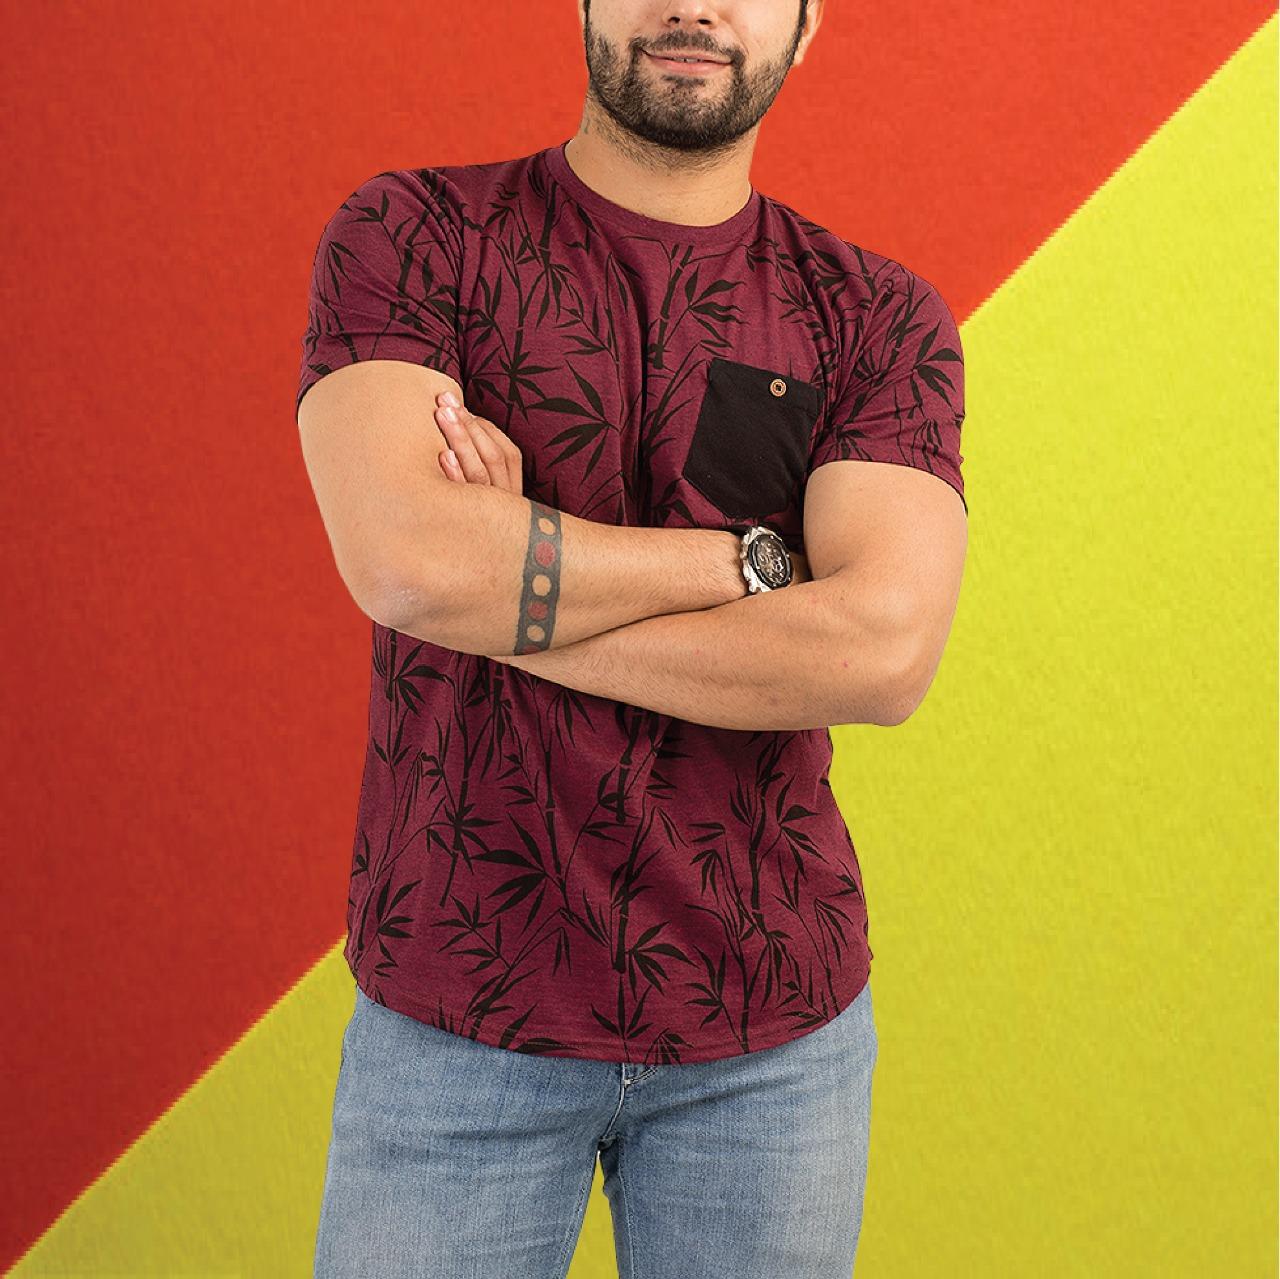 Short Sleeves Allover Leaf Printed Tshirt For Men Paradise zone